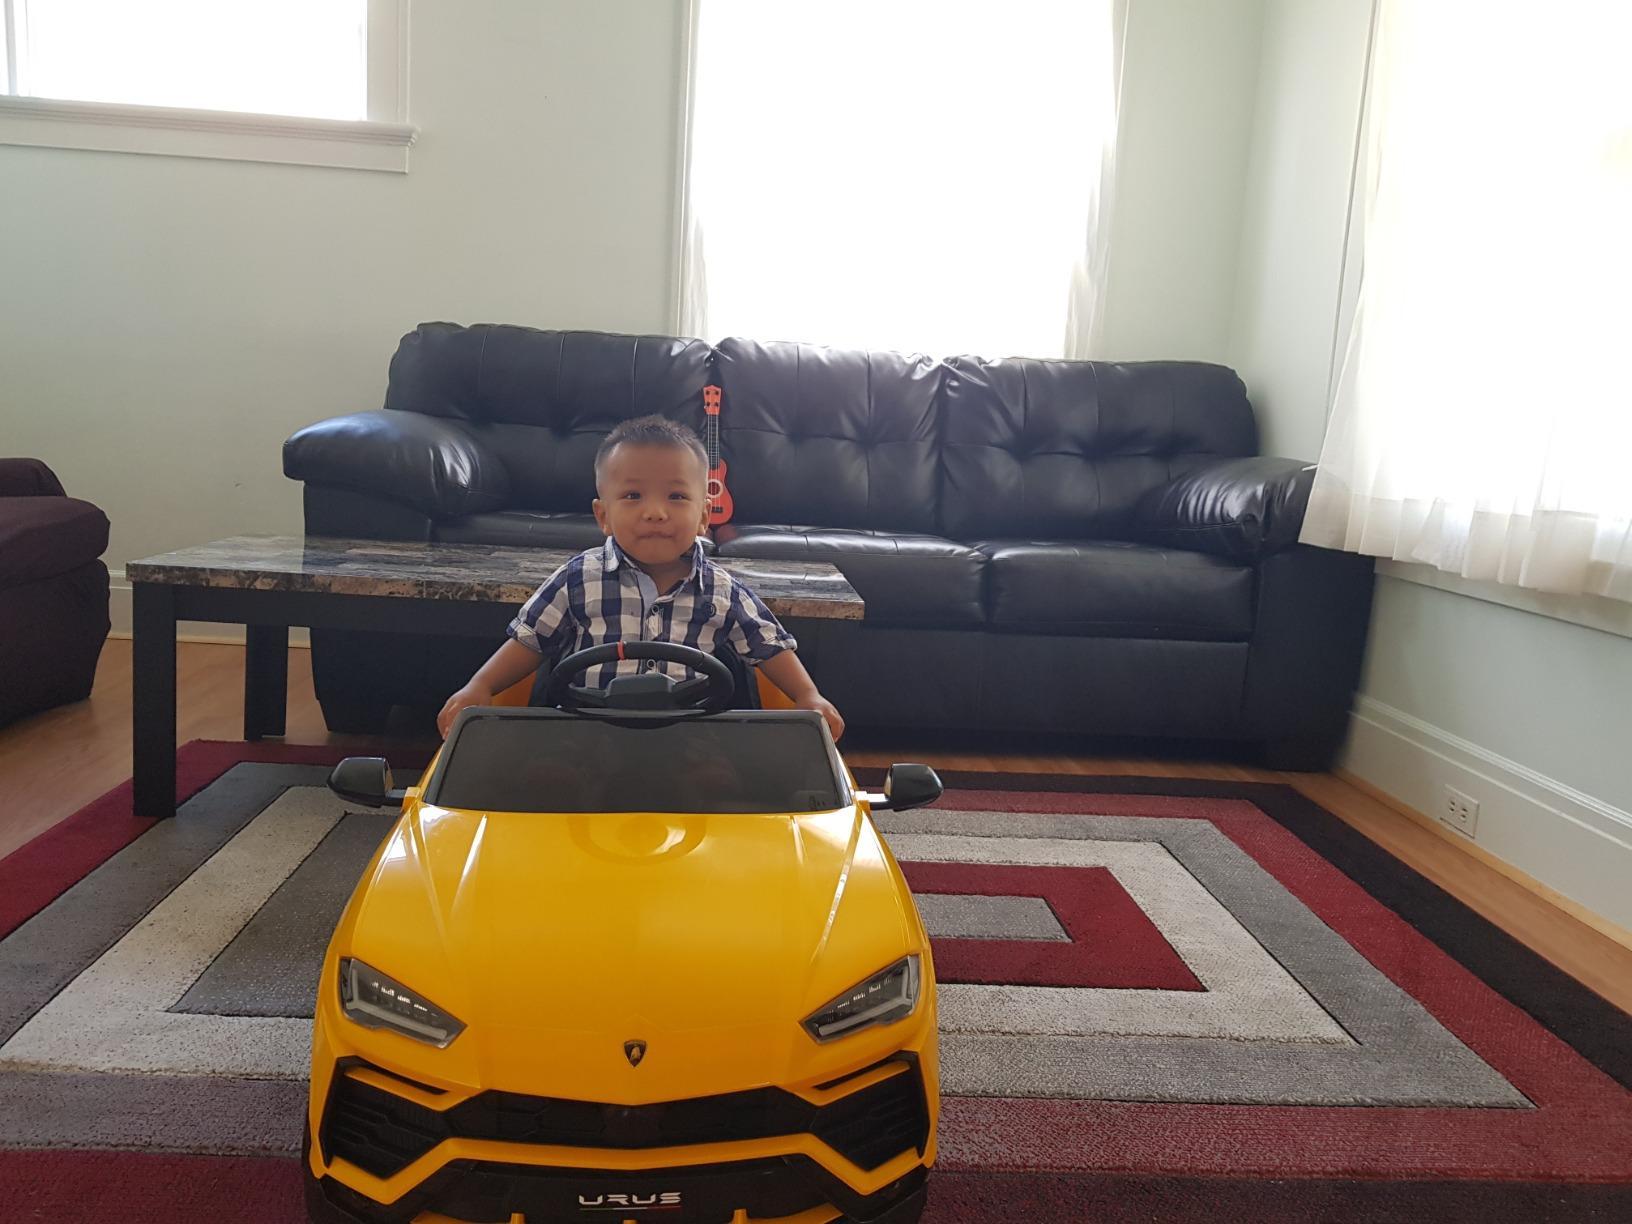 12V Lamborghini Ride On Car With Remote Control, Yellow photo review